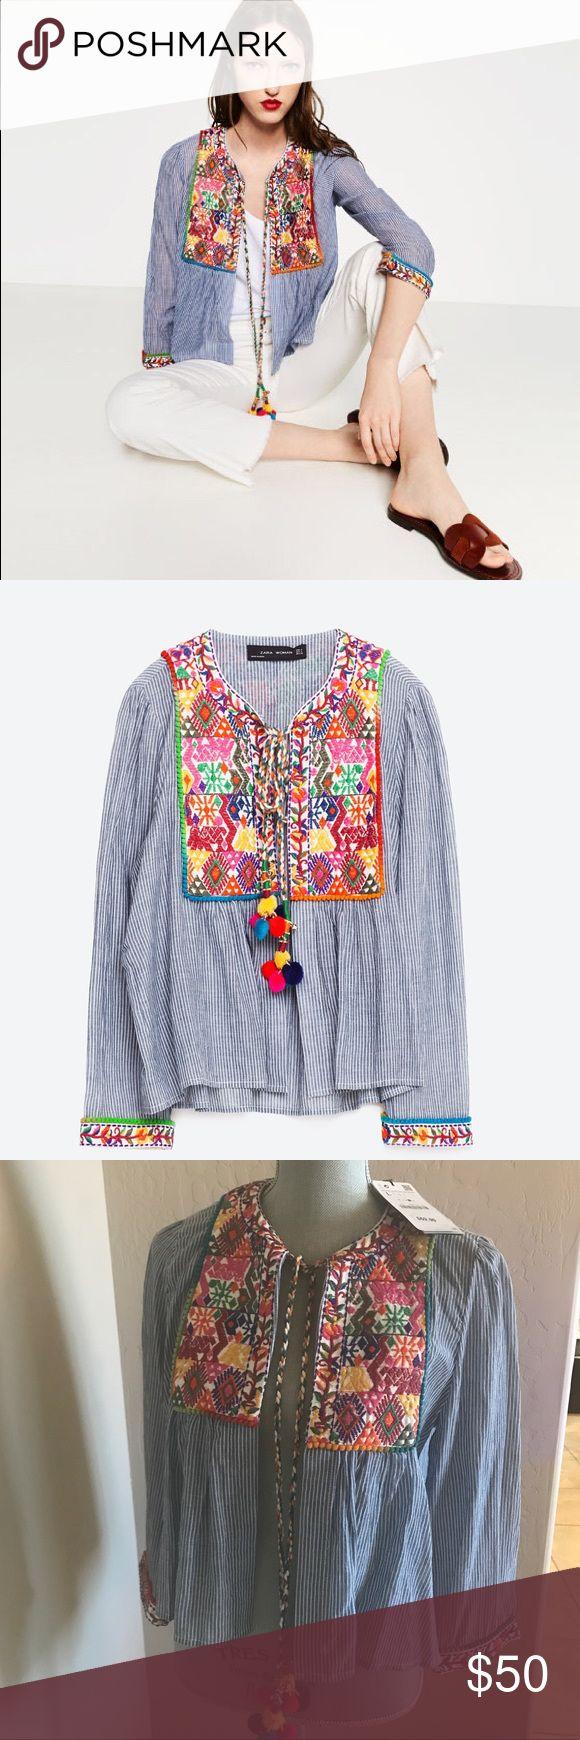 Zara embroidered jacket Zara embroidered jacket NWT size L Zara Jackets & Coats Capes